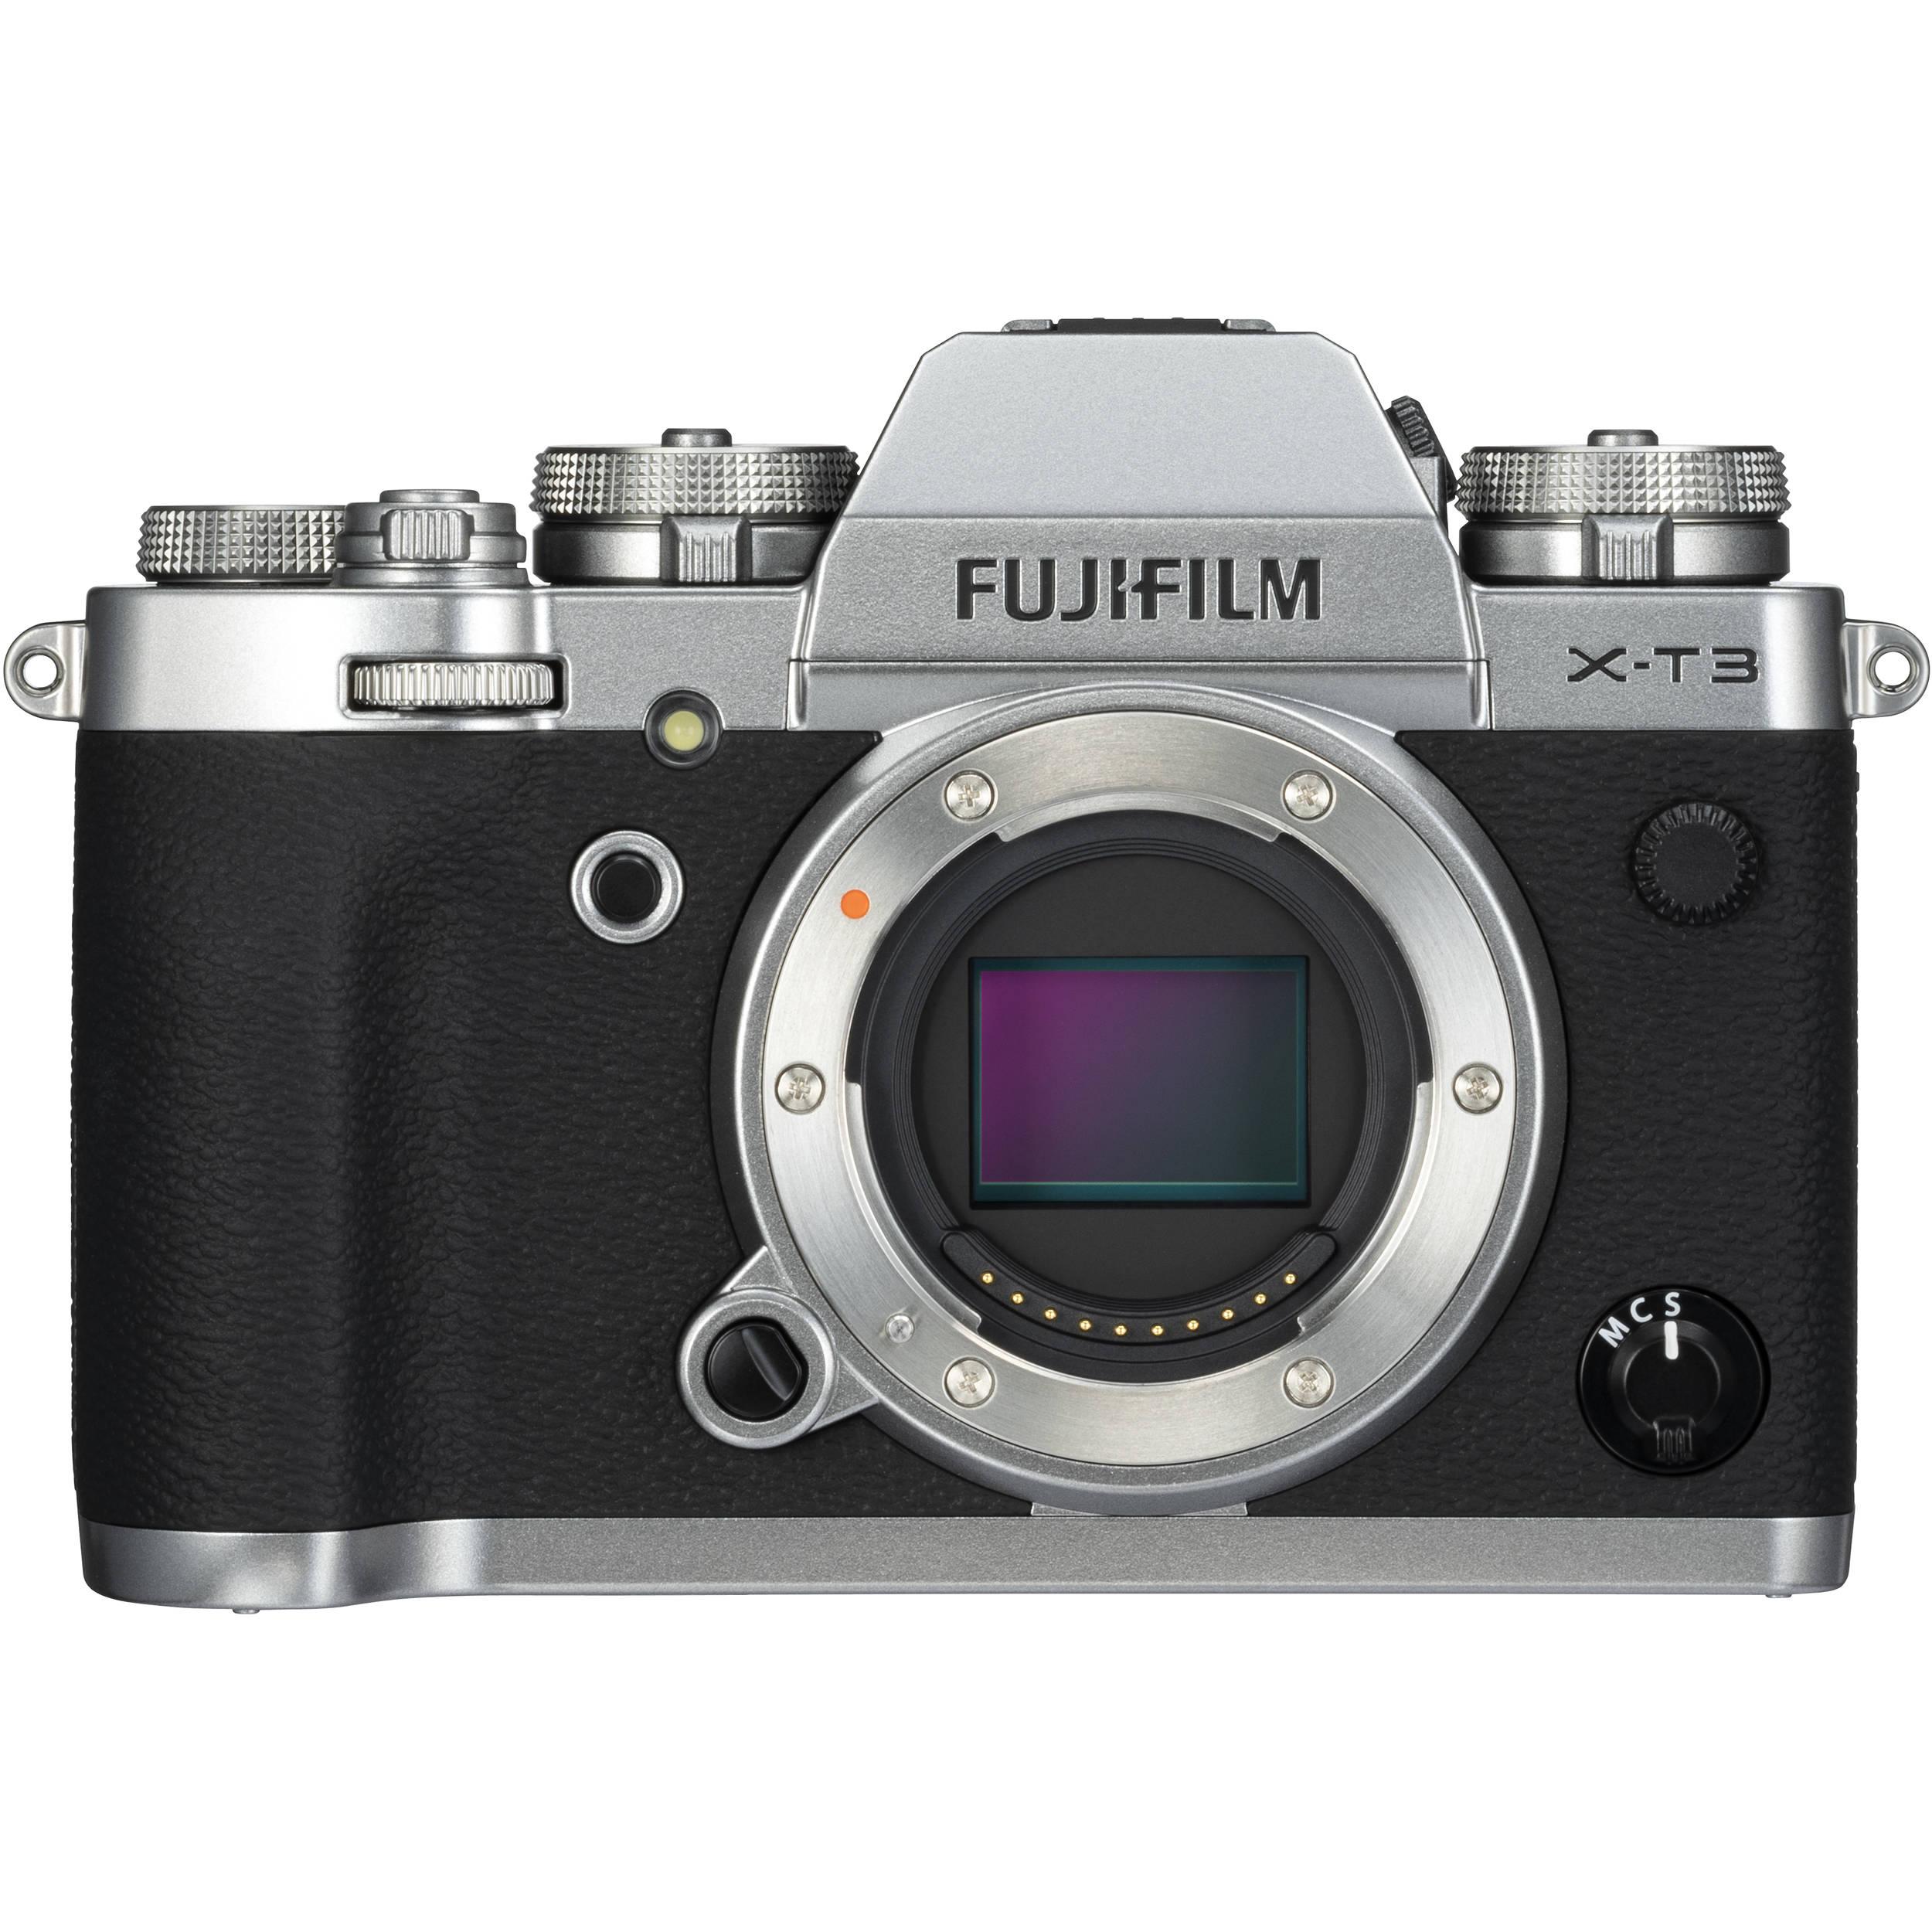 Fujifilm XT3 Silver Body